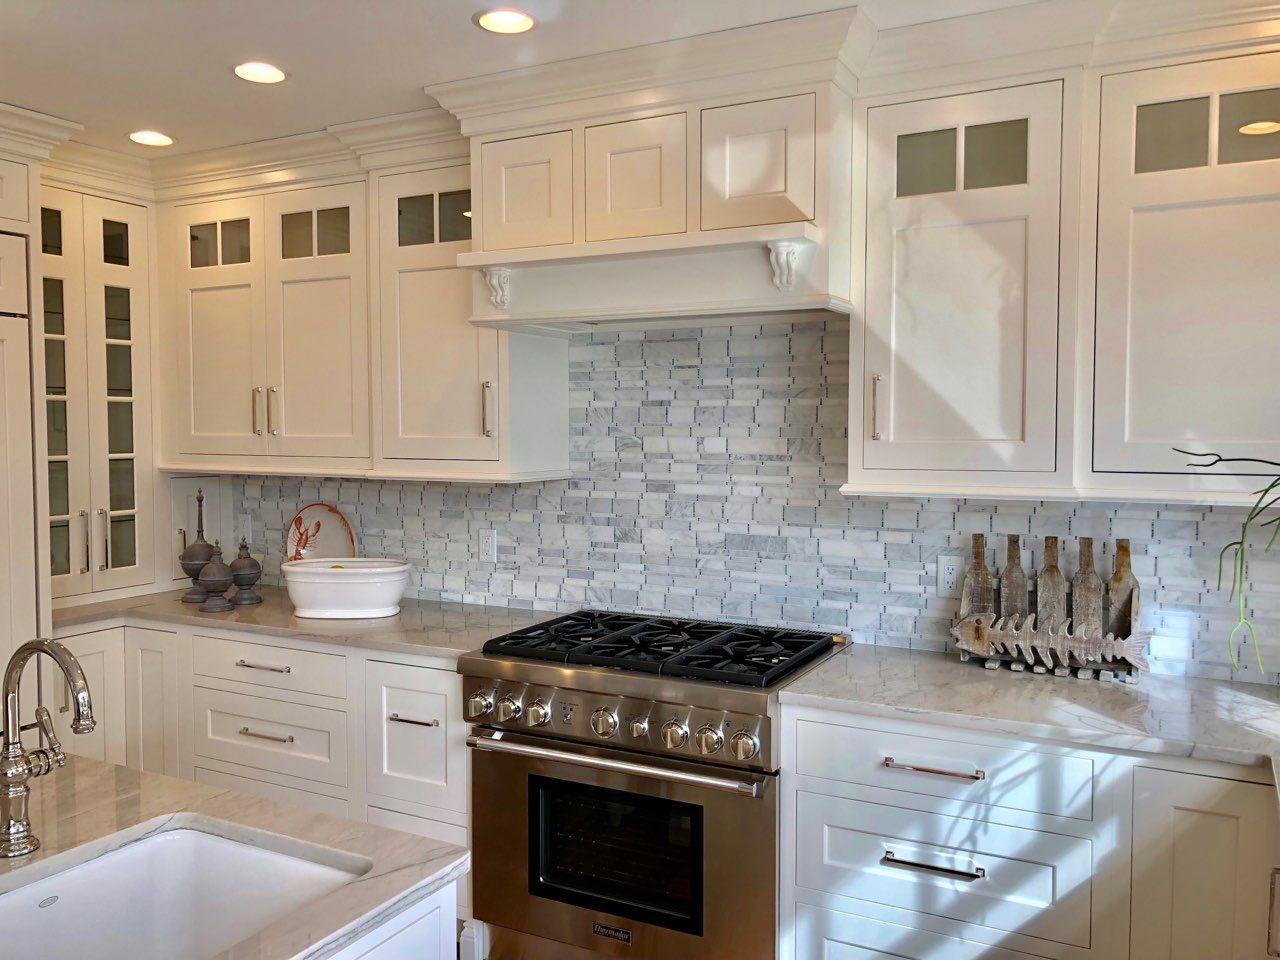 pinideal floor covering on kitchen ideas  kitchen